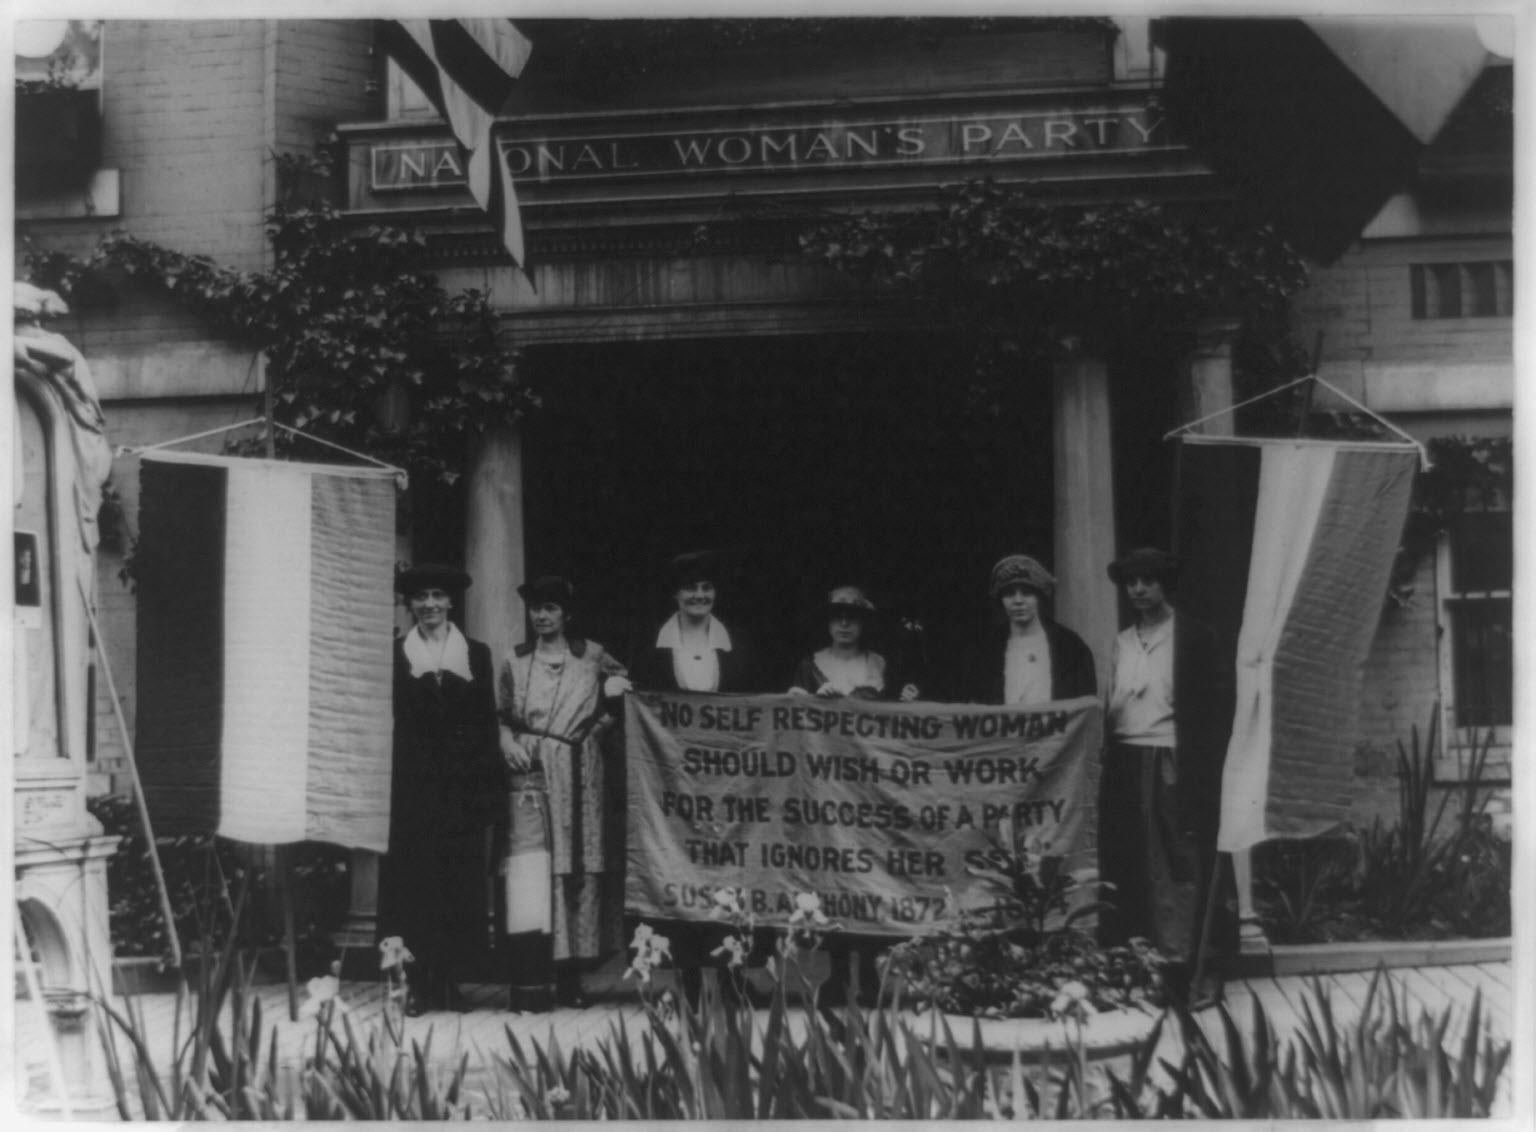 Suffrage Quotes: Susan B Anthony Temperance Quotes. QuotesGram